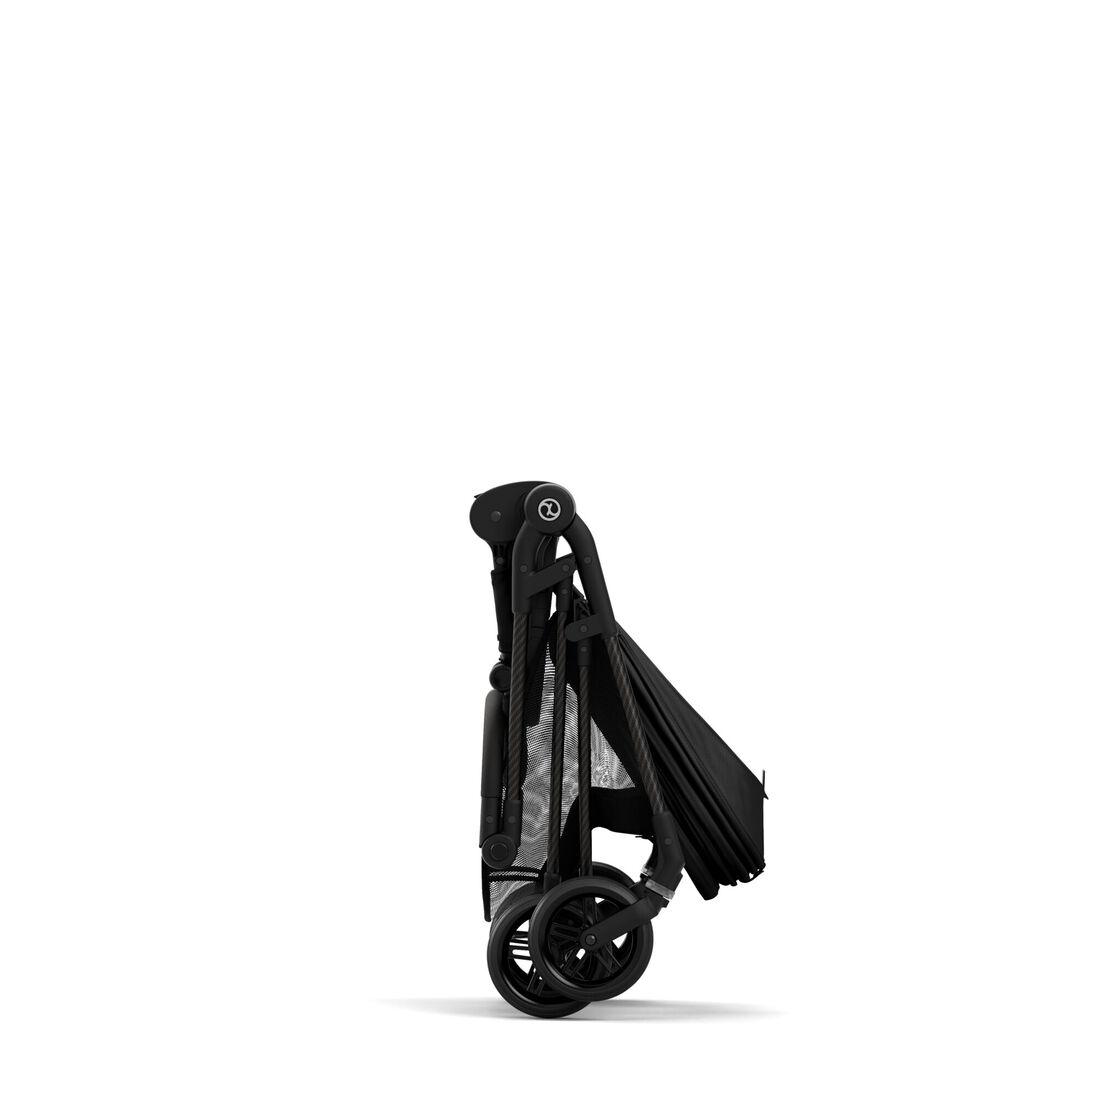 CYBEX Melio Carbon - Deep Black in Deep Black large Bild 7